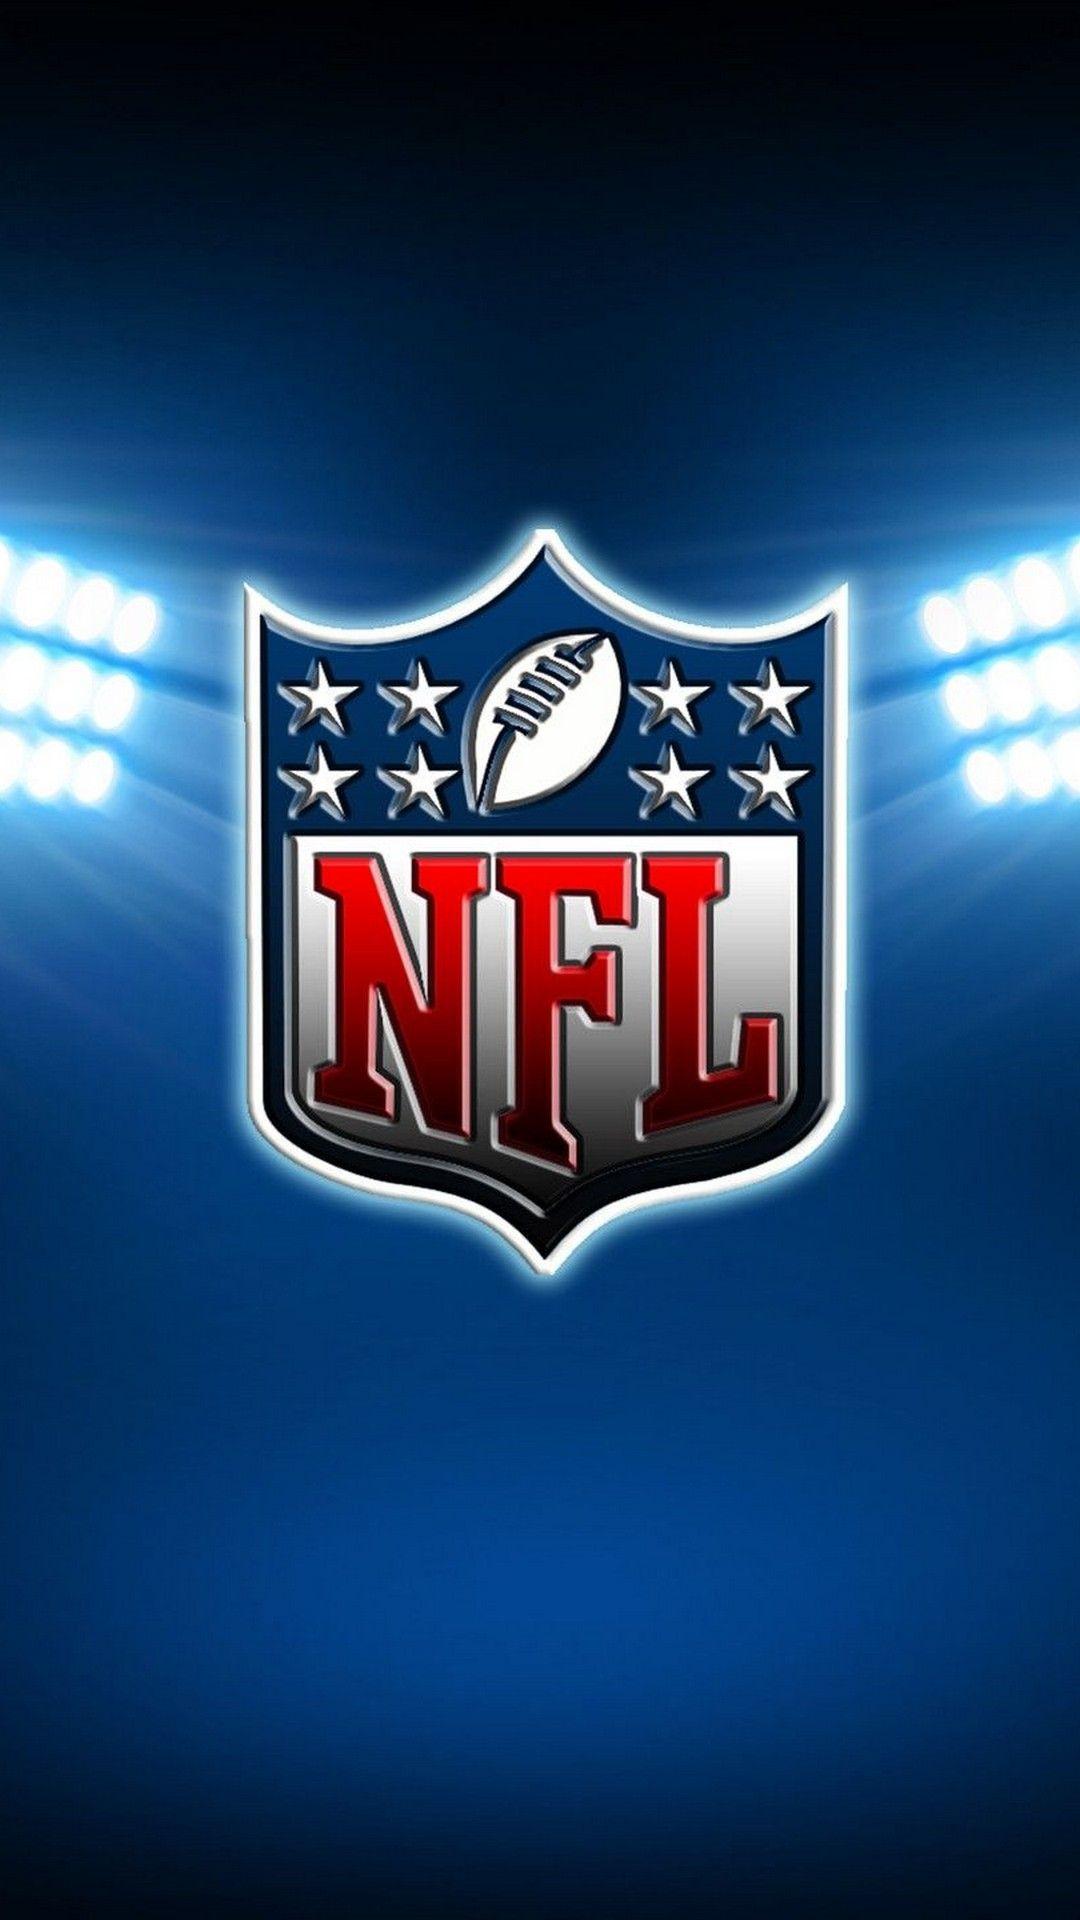 NFL iPhone 6 Wallpaper Nfl season, Nfl logo, Nfl football